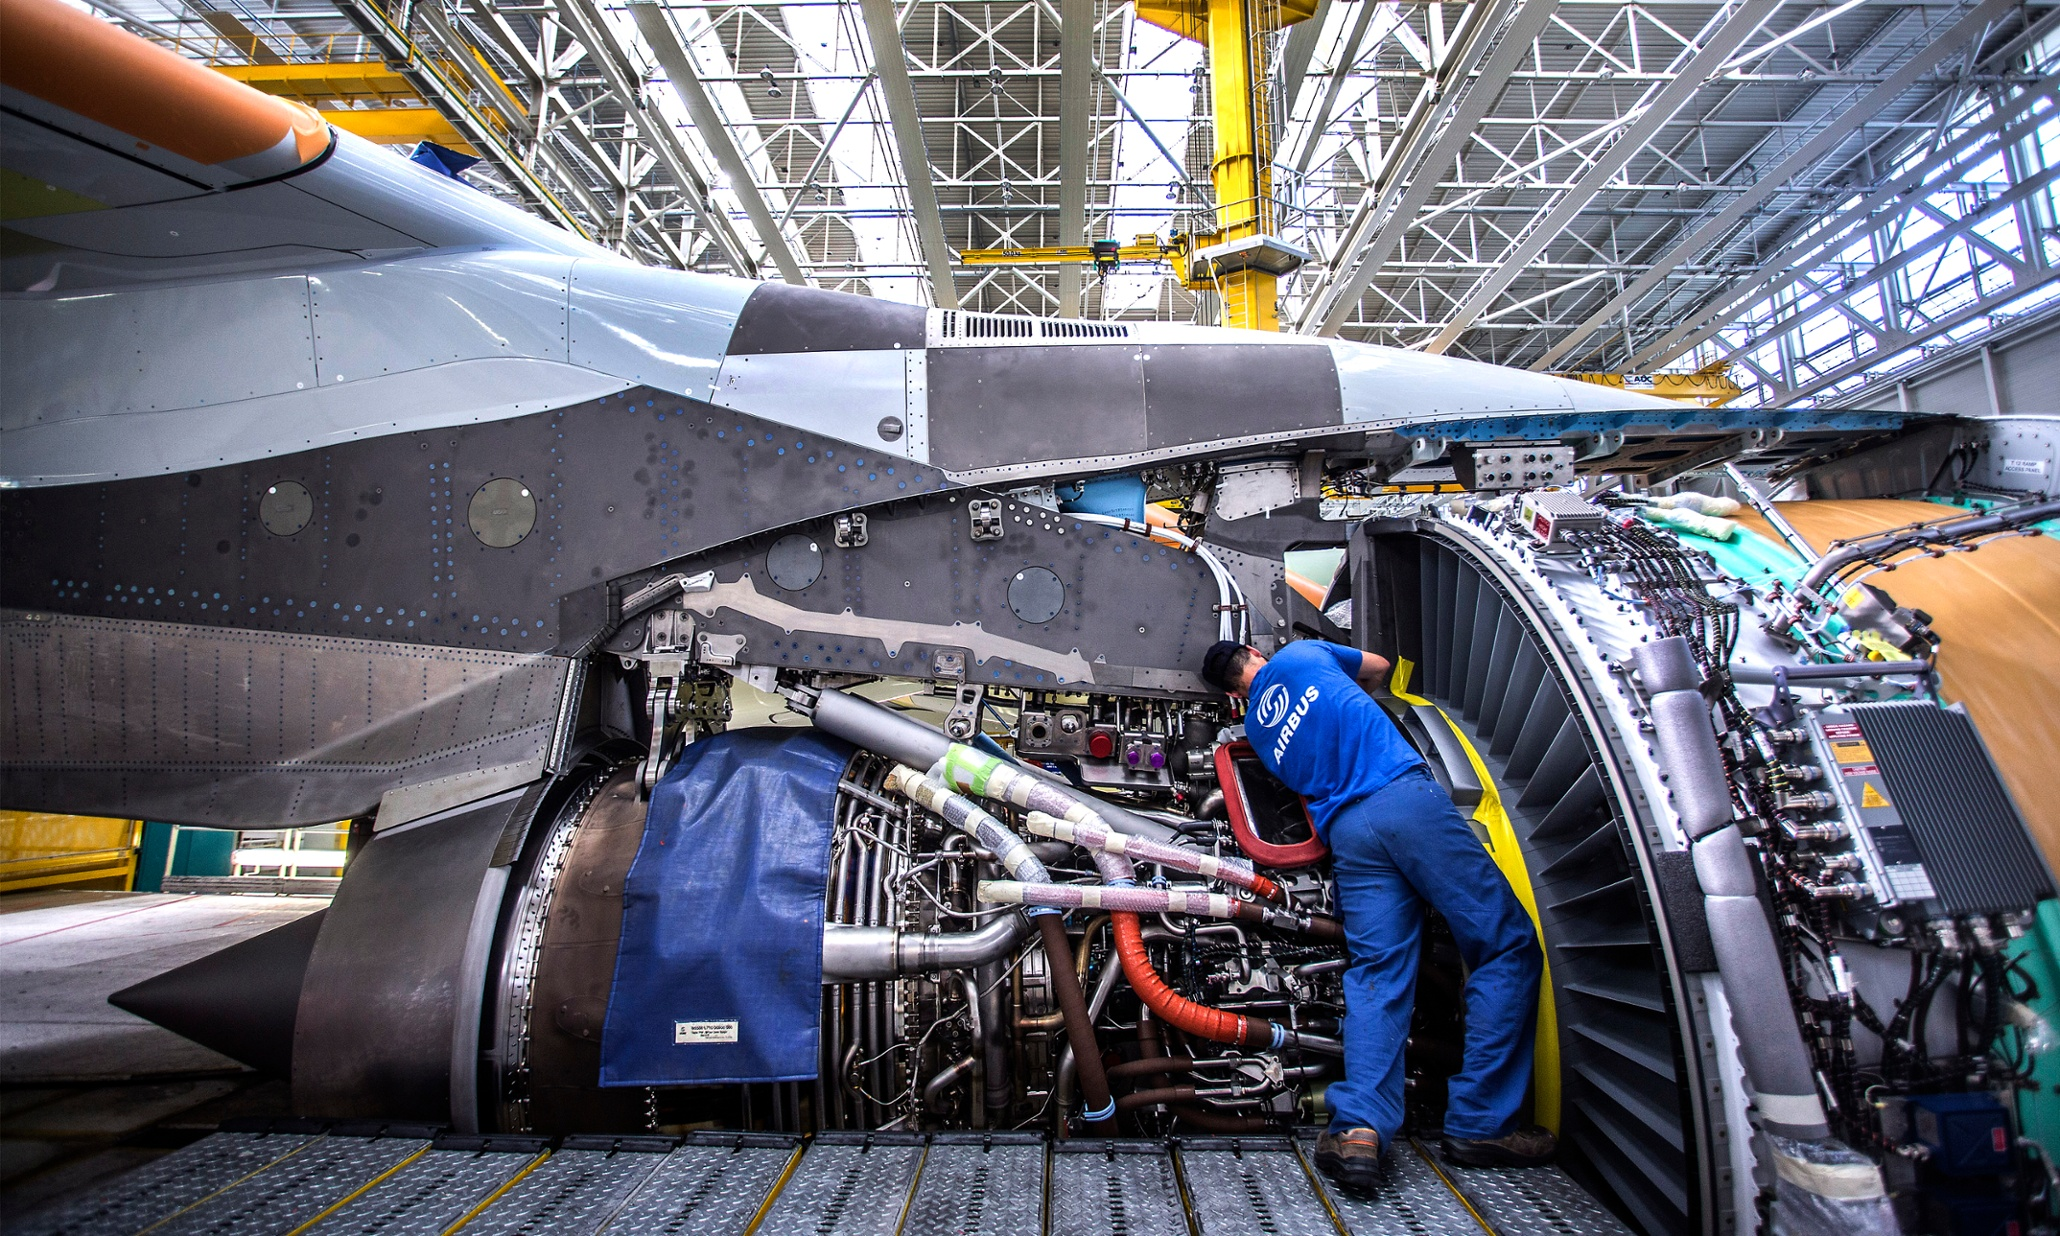 Resultado de imagem para Rolls-Royce jatos